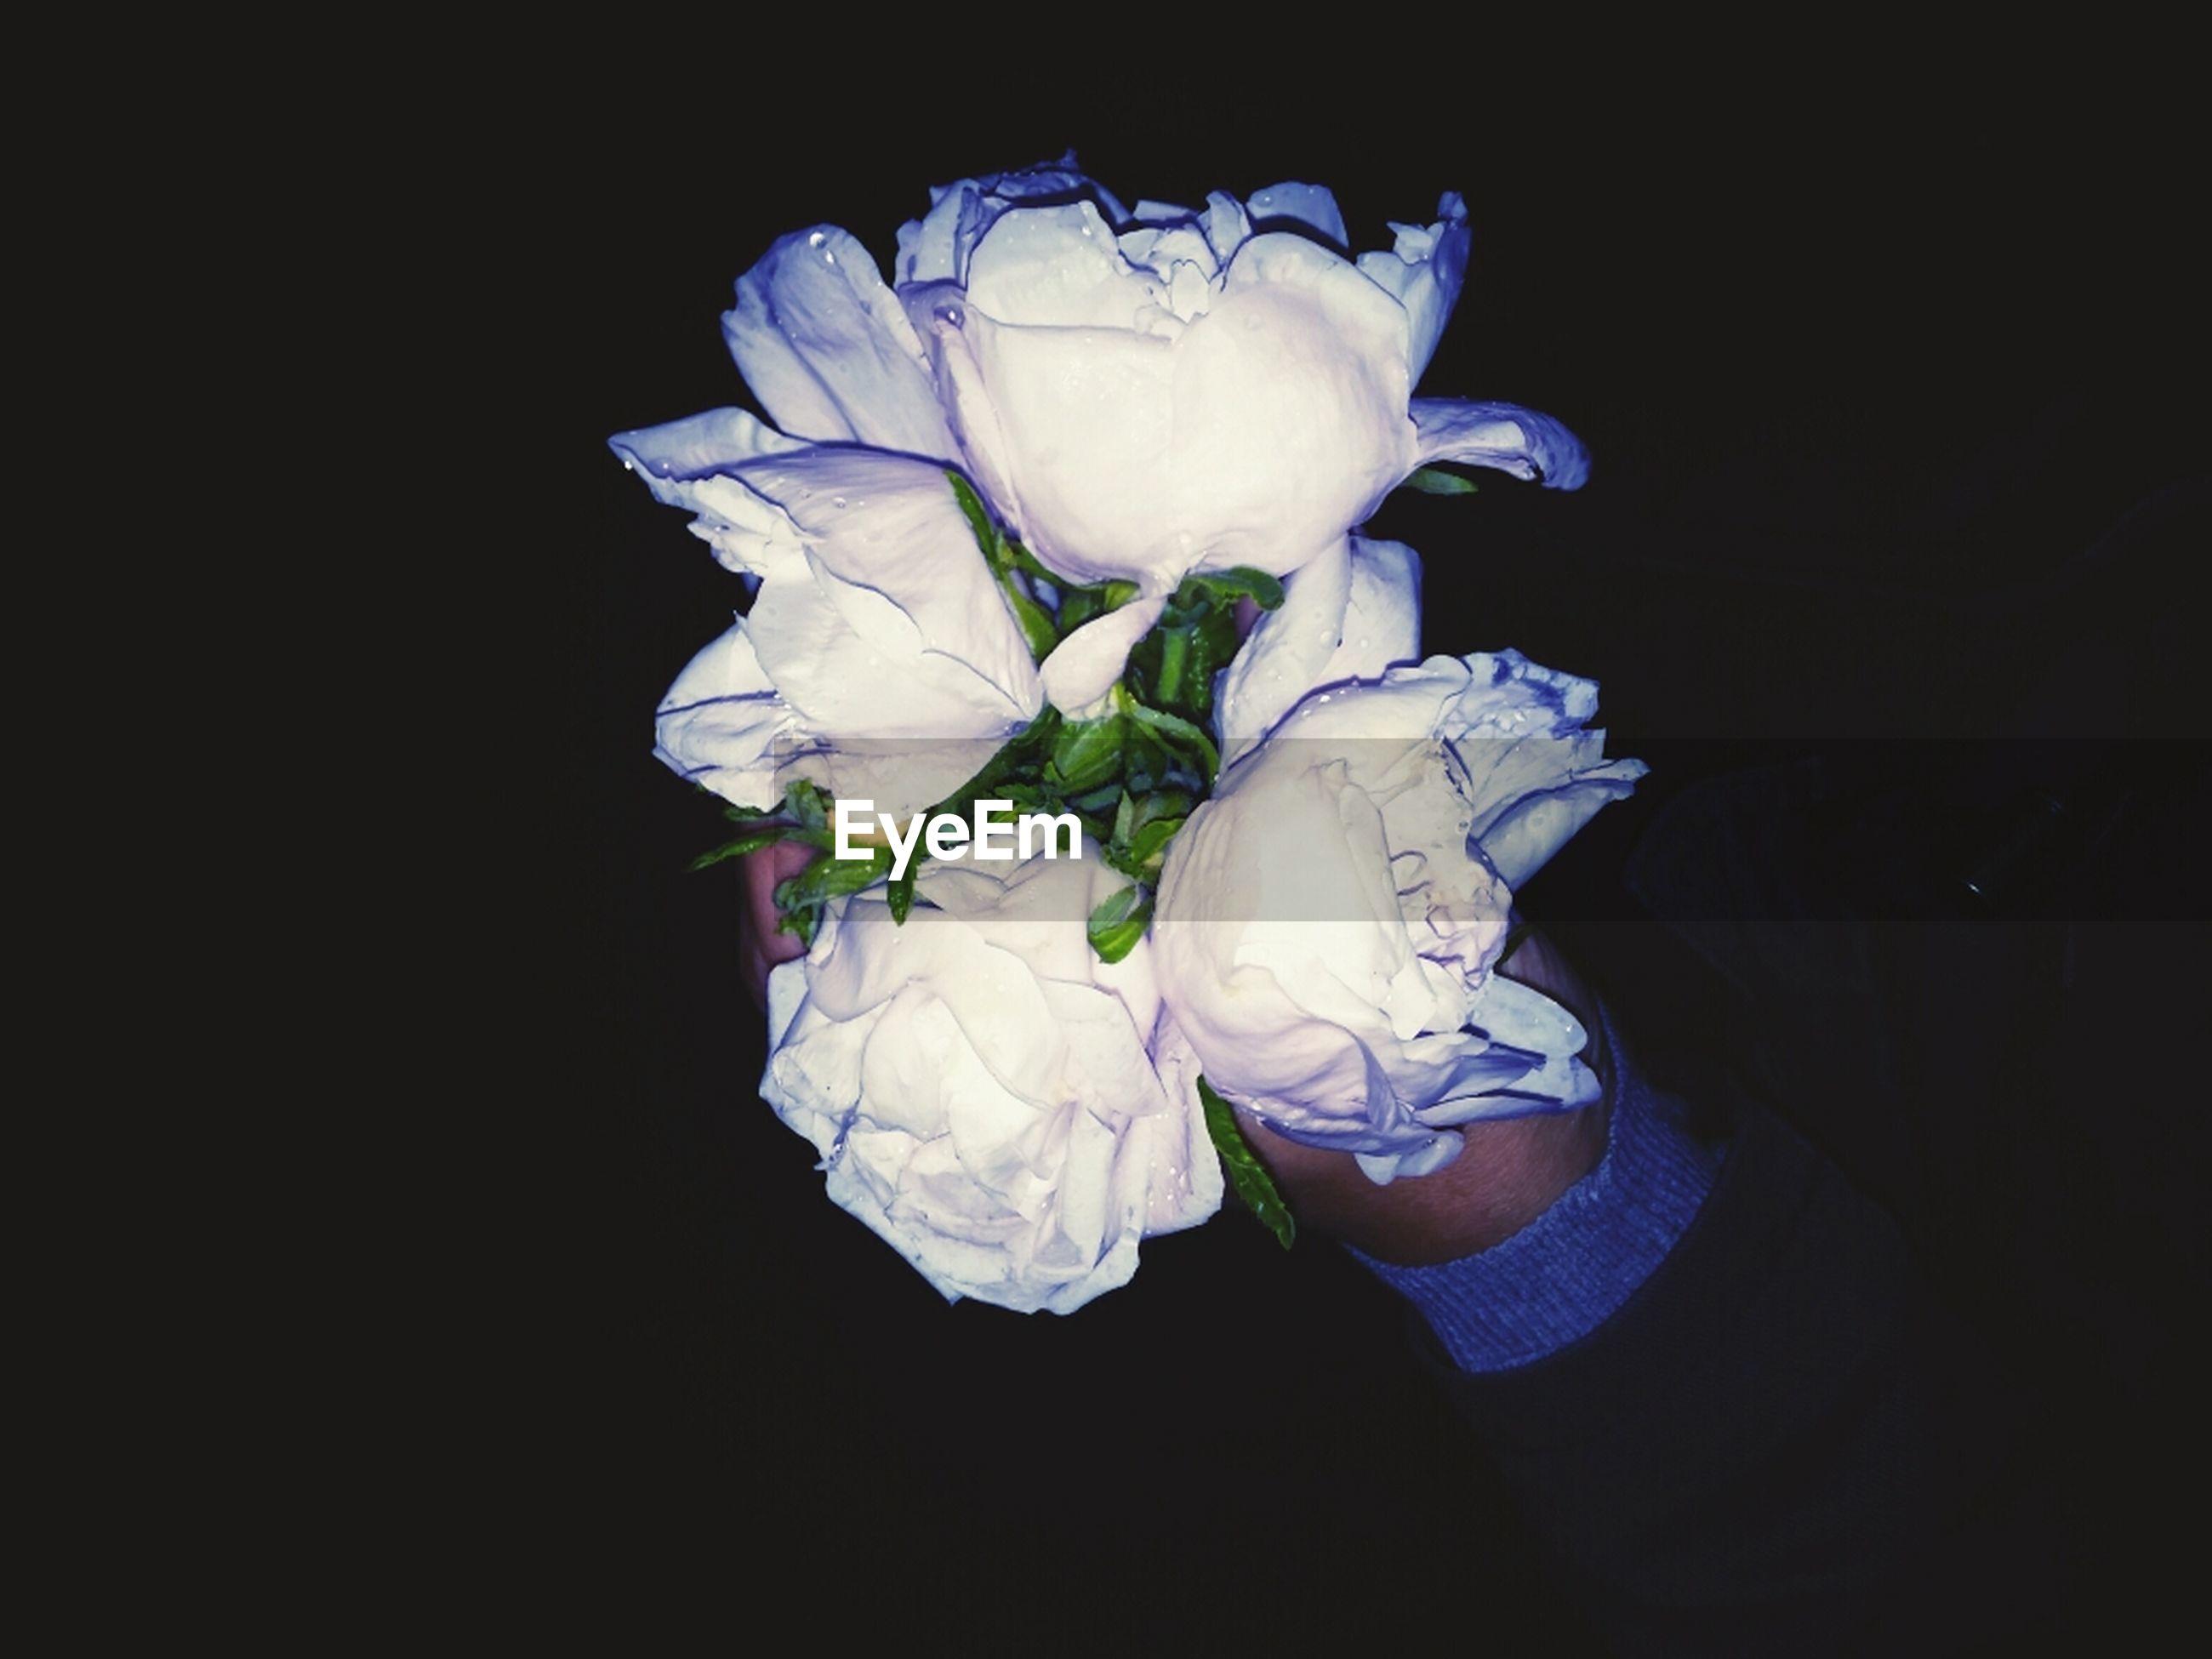 flower, black background, petal, studio shot, flower head, fragility, white color, freshness, close-up, beauty in nature, single flower, white, copy space, nature, night, rose - flower, dark, blooming, blossom, softness